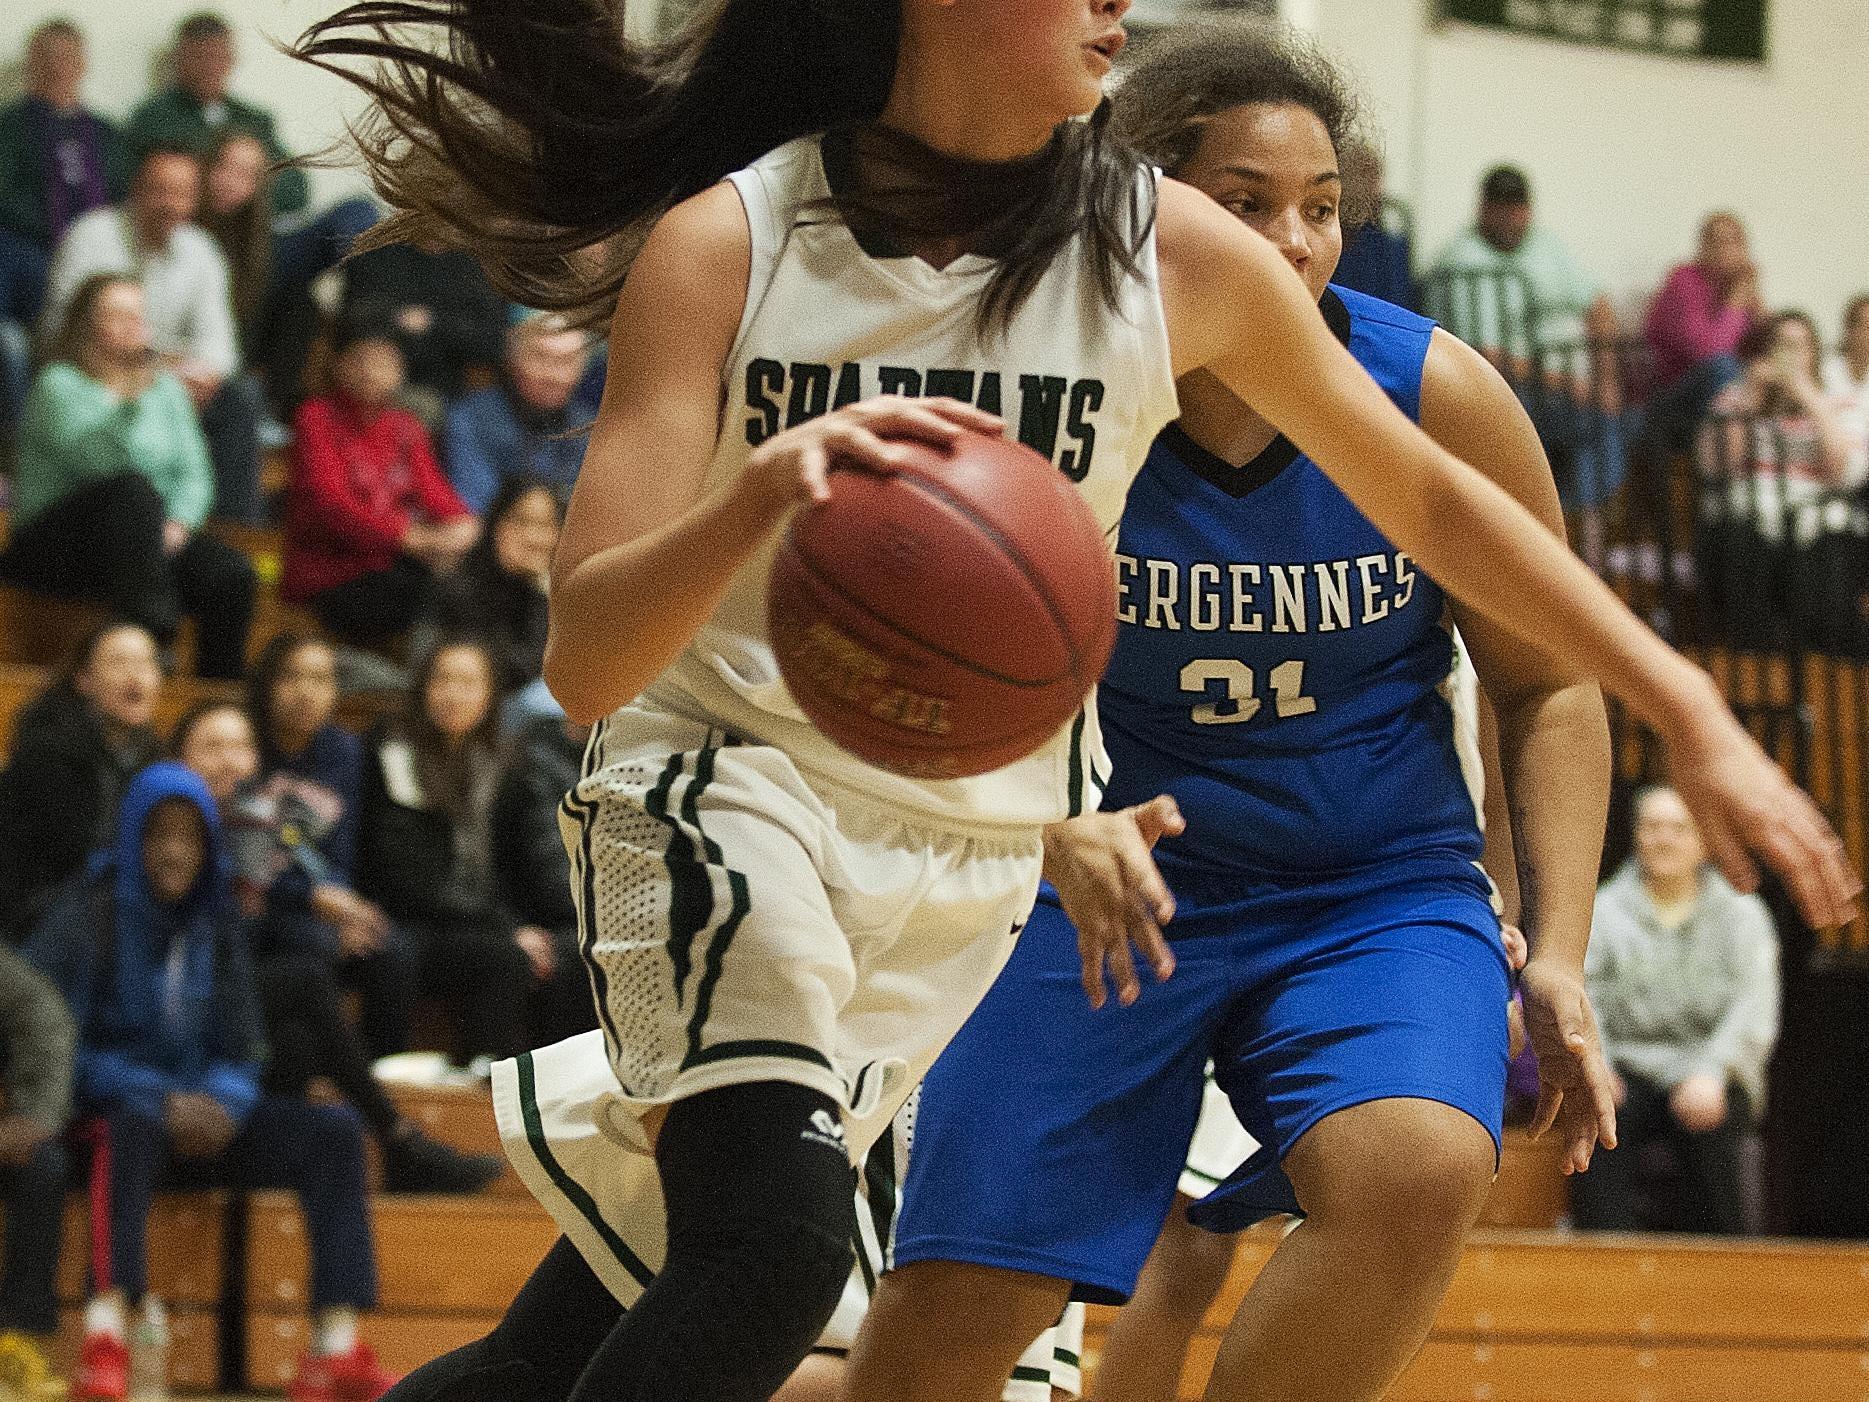 Winooski's Niki Dang (20) drives to the hoop during the girls basketball game between Vergennes and Winooski at Winooski High School on Wednesday.